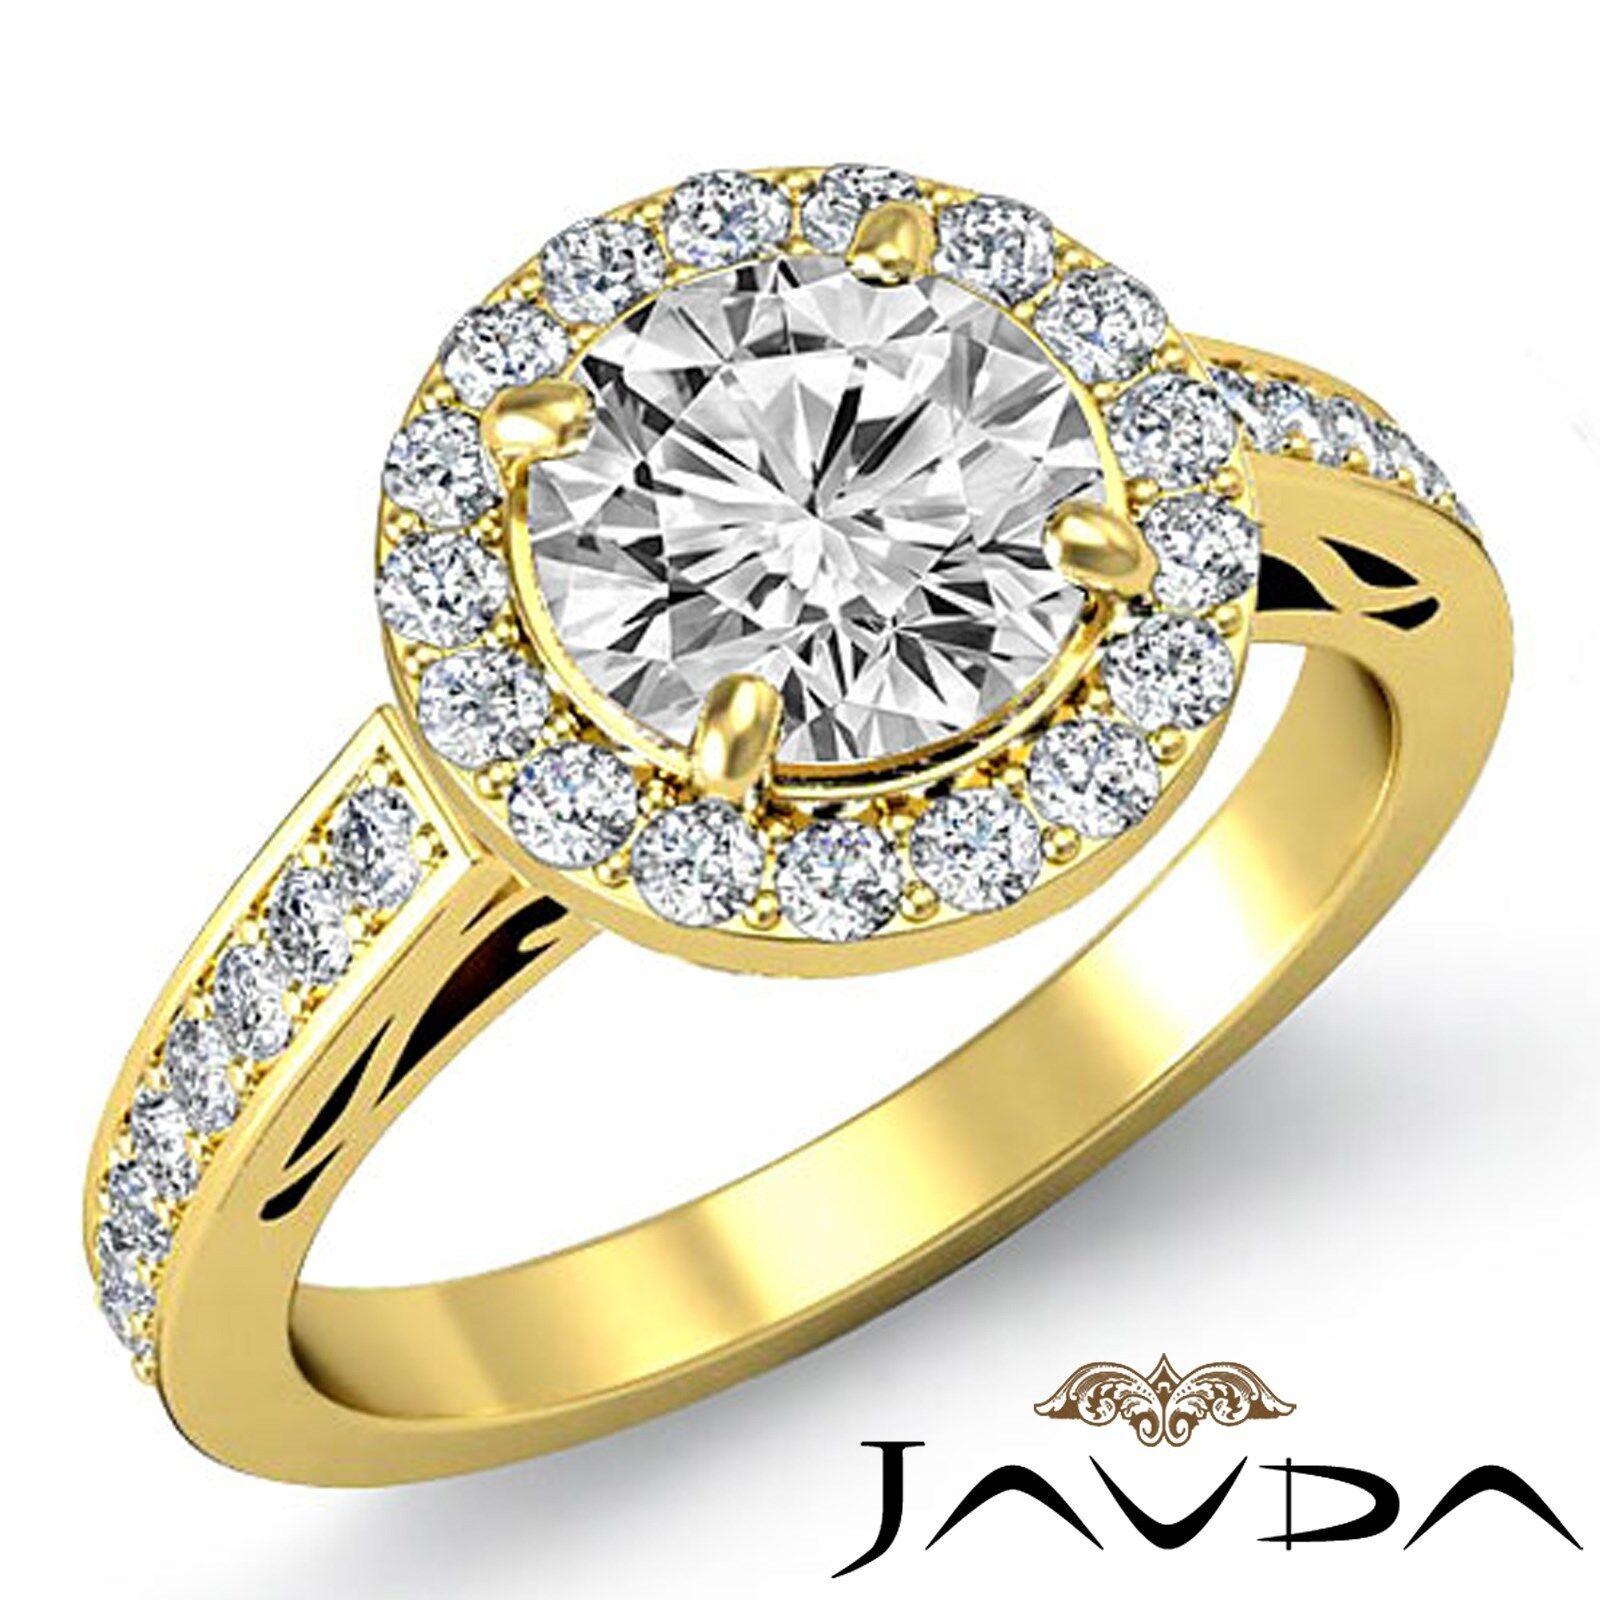 Halo Filigree Pave Set Round Diamond Engagement Anniversary Ring GIA G VS1 2.8Ct